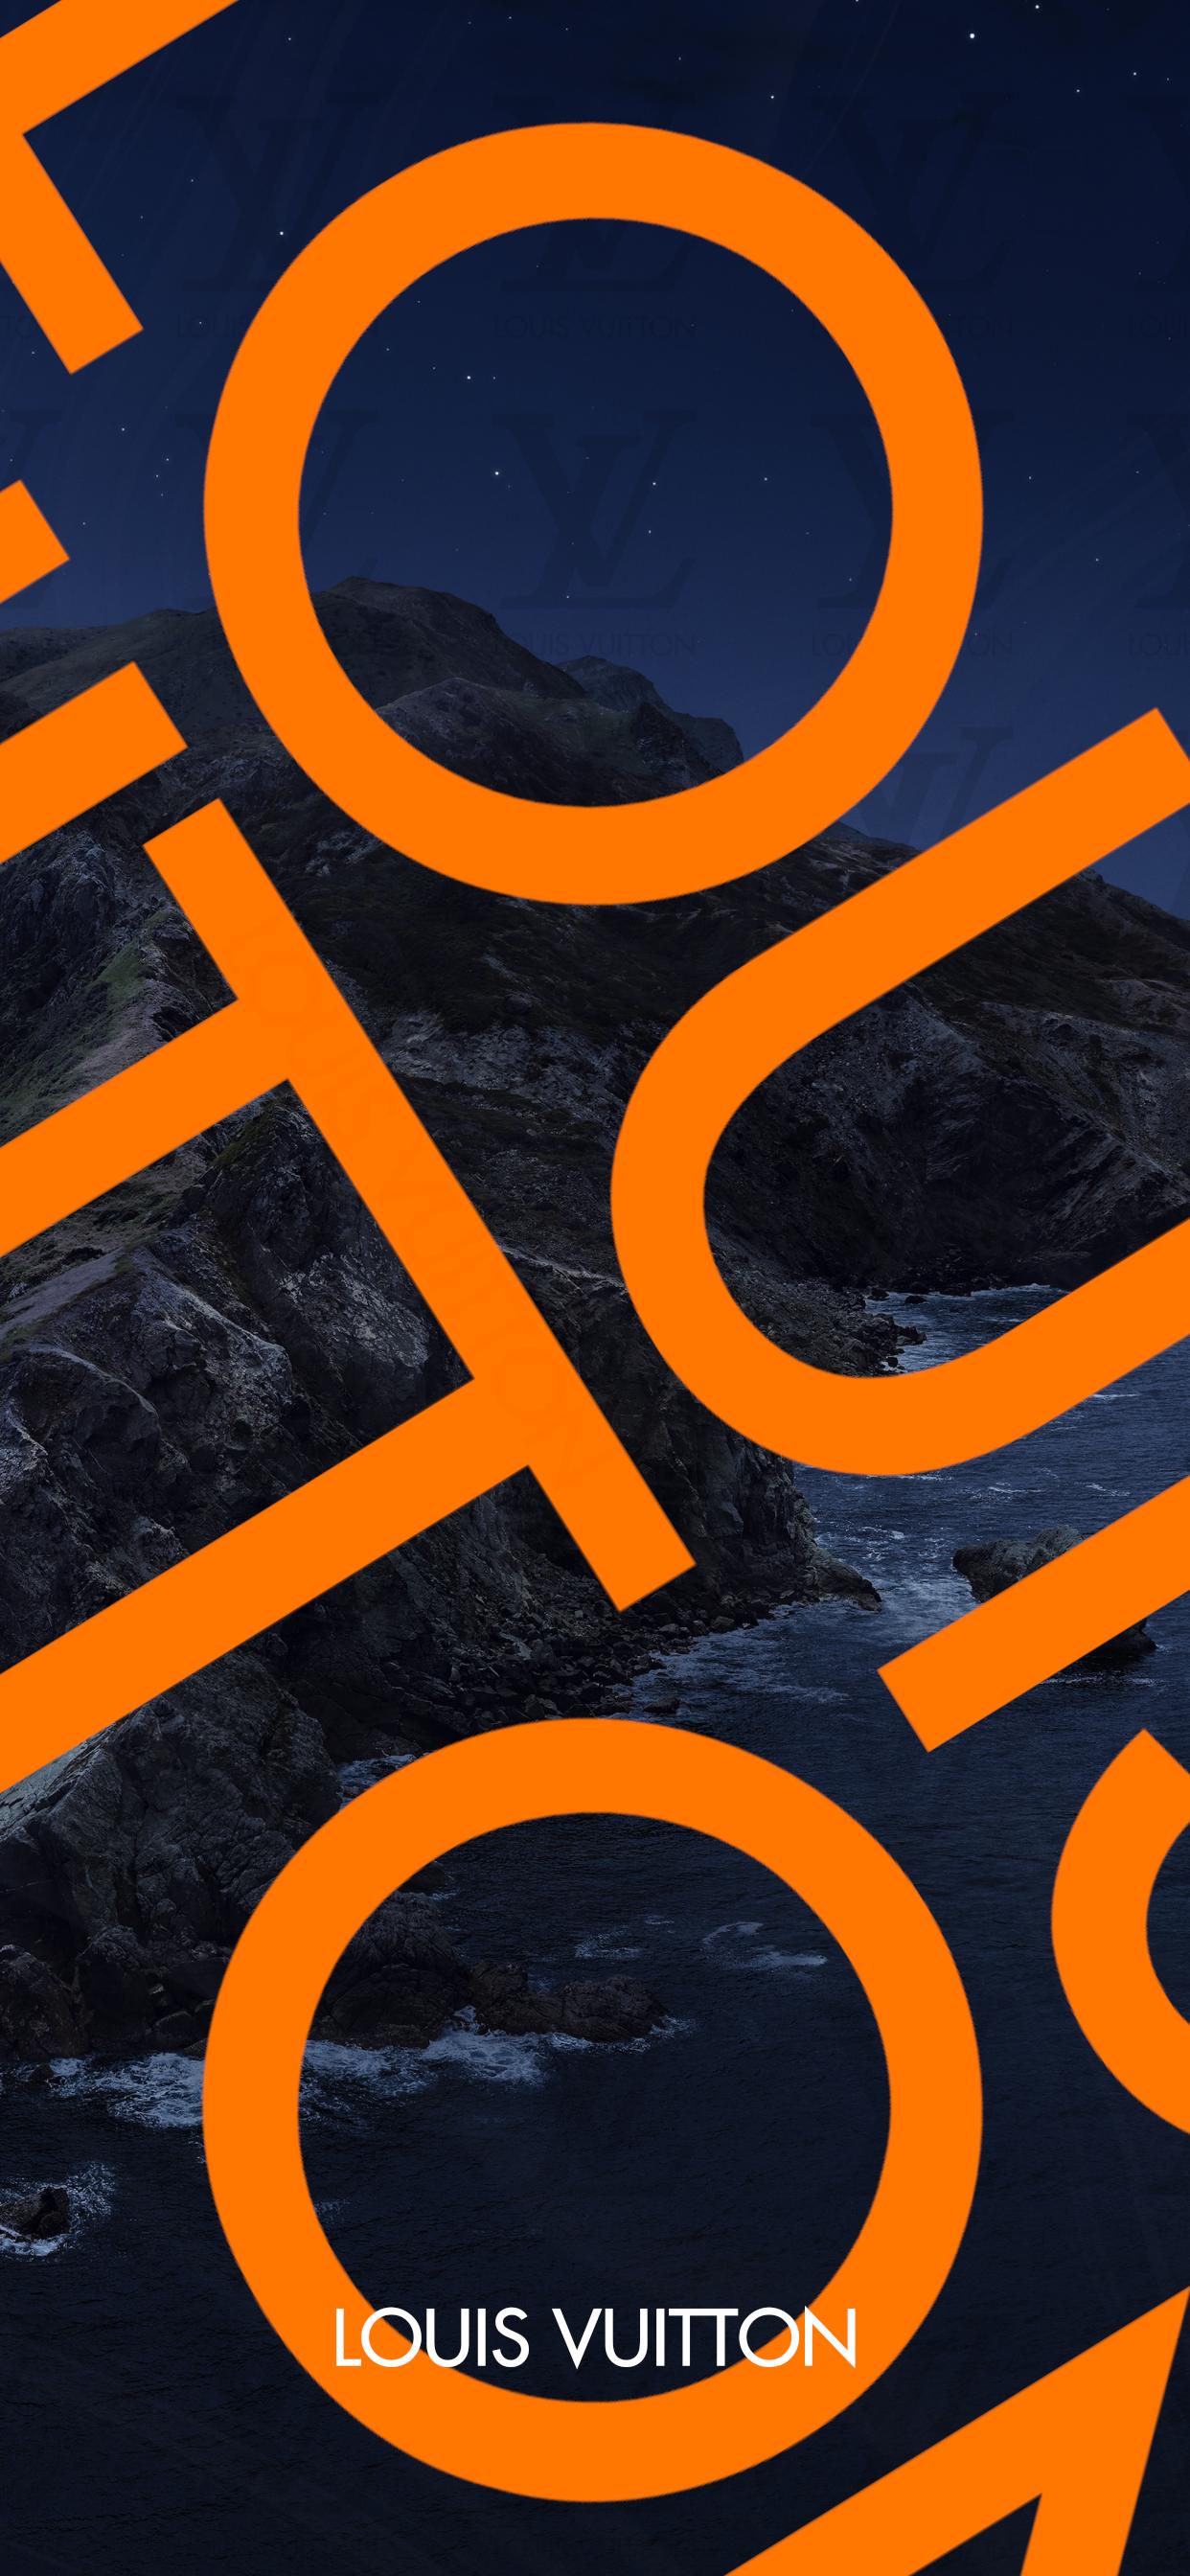 LOUIS_VUITTON iPhone X Ratio Series Wallpaper 배경화면, 아이폰